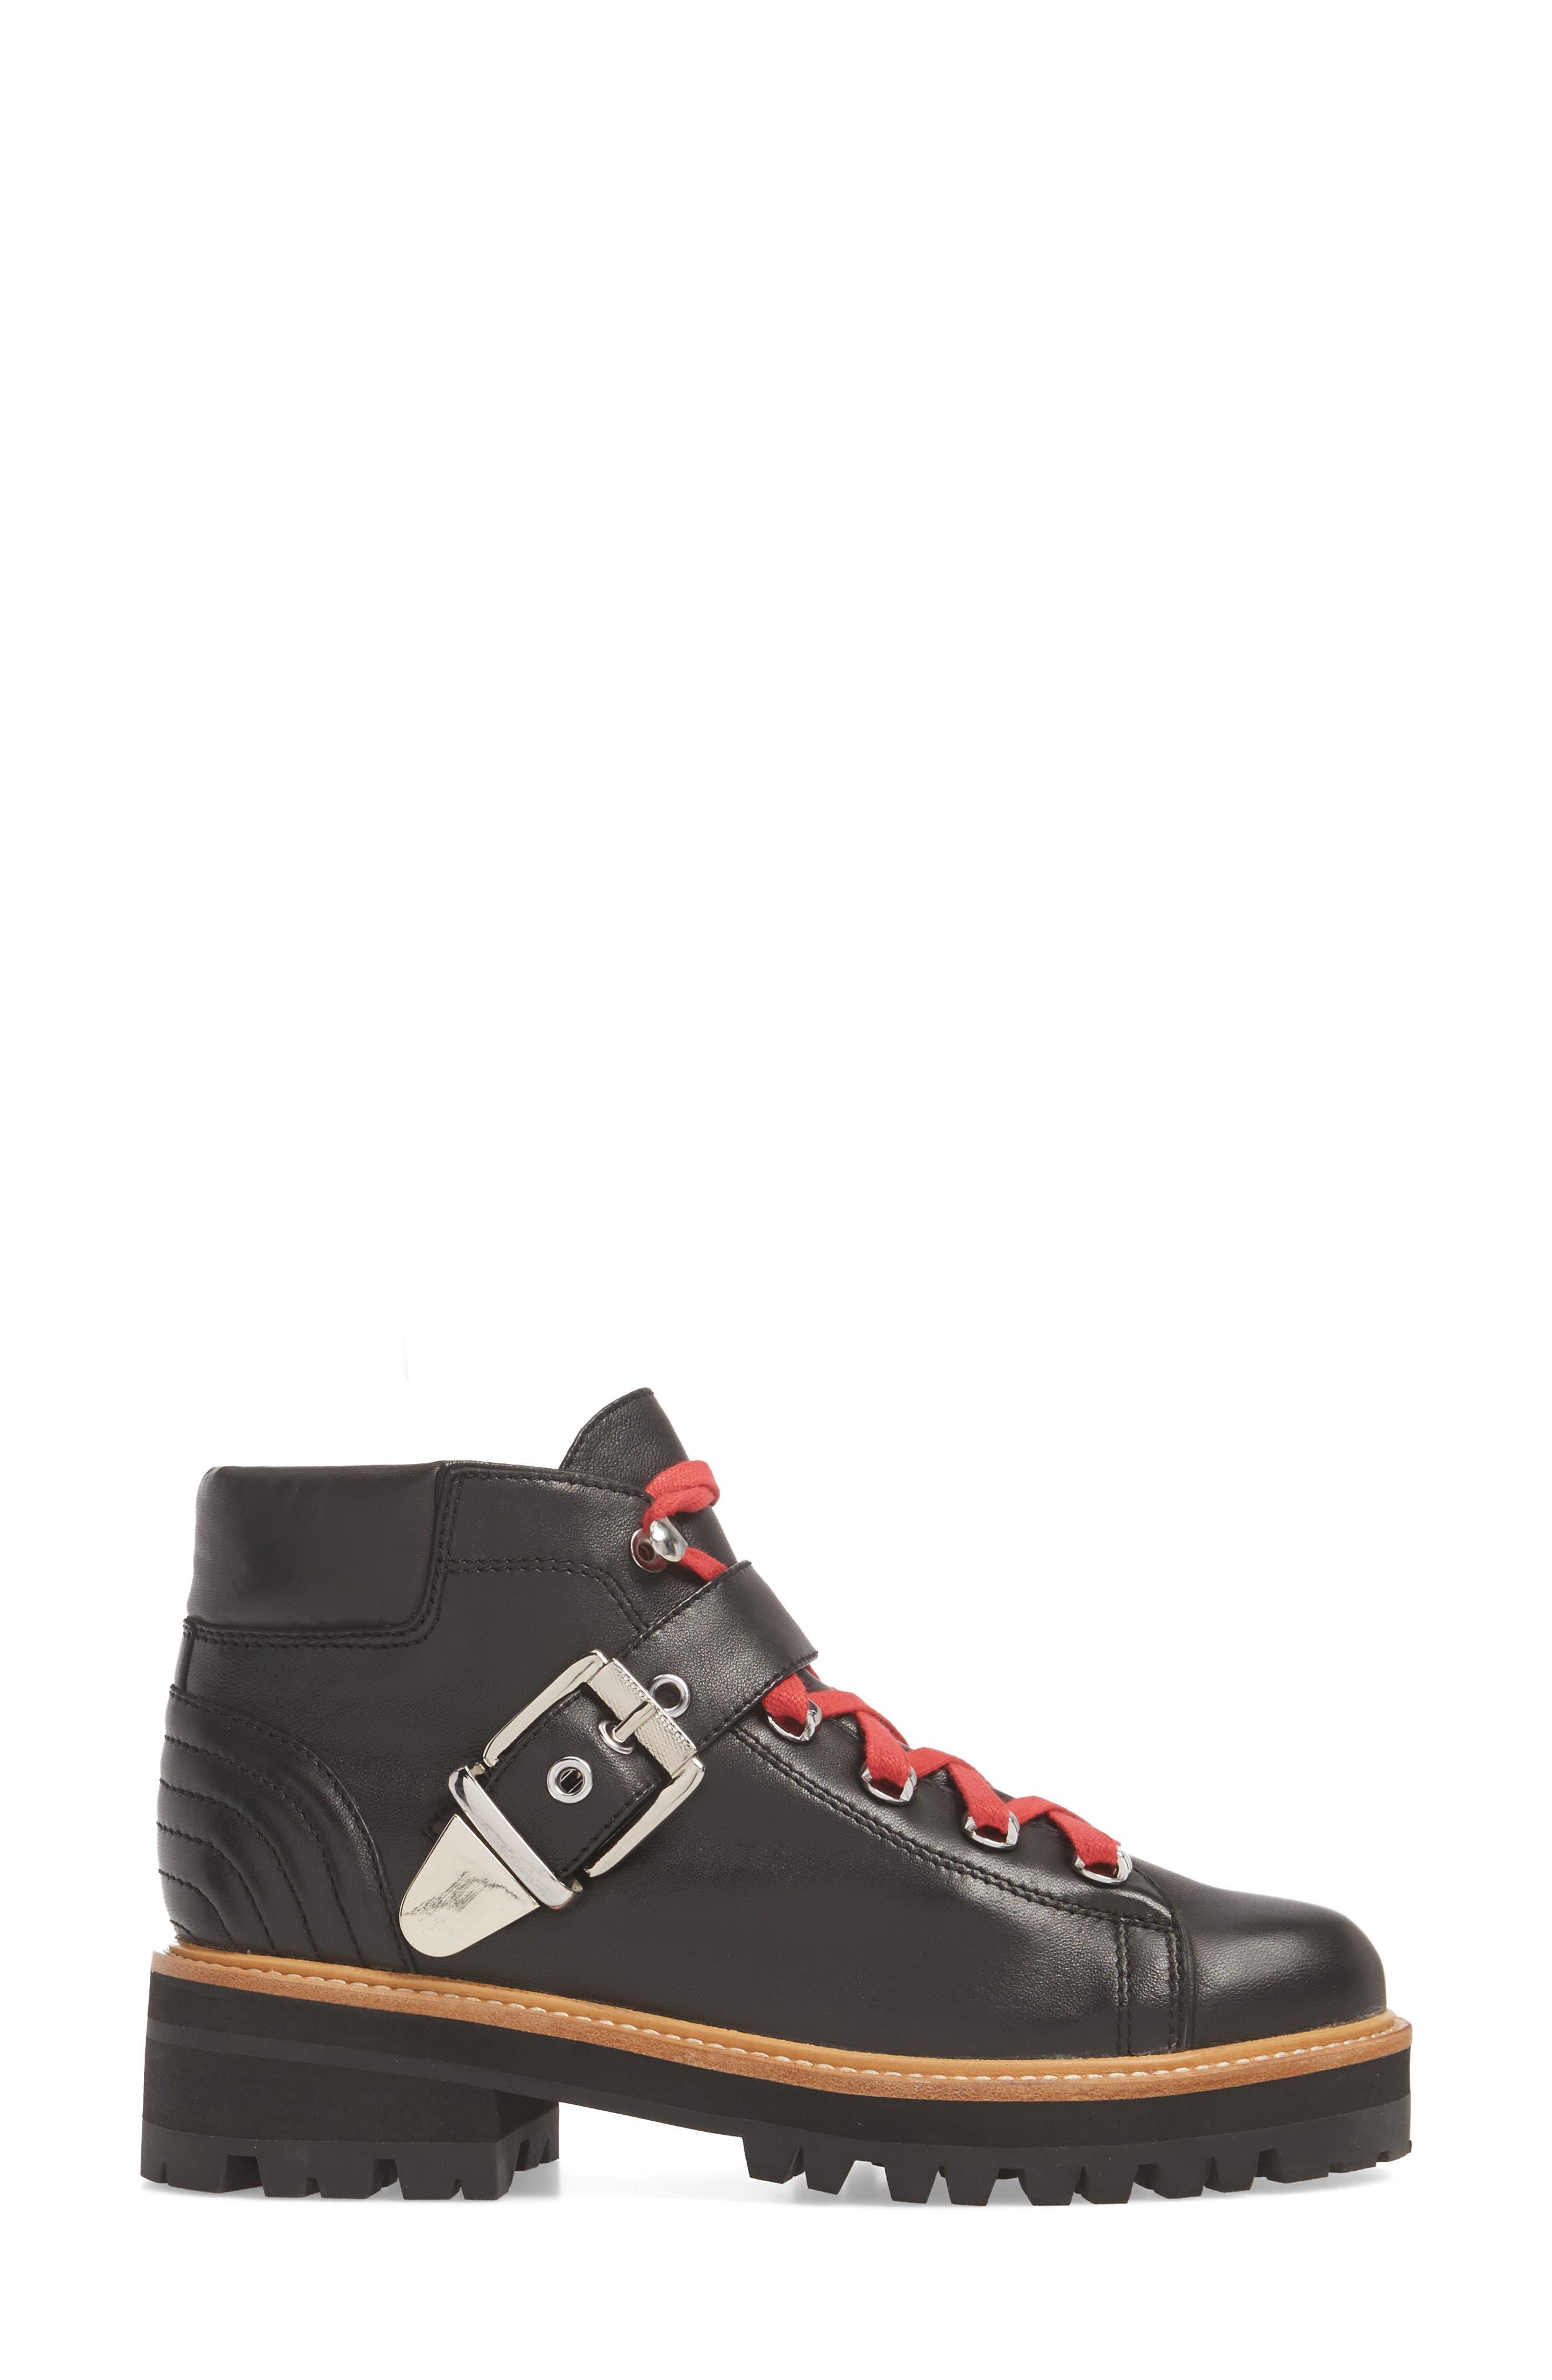 Indre Platform Boot,                             Alternate thumbnail 3, color,                             BLACK LEATHER